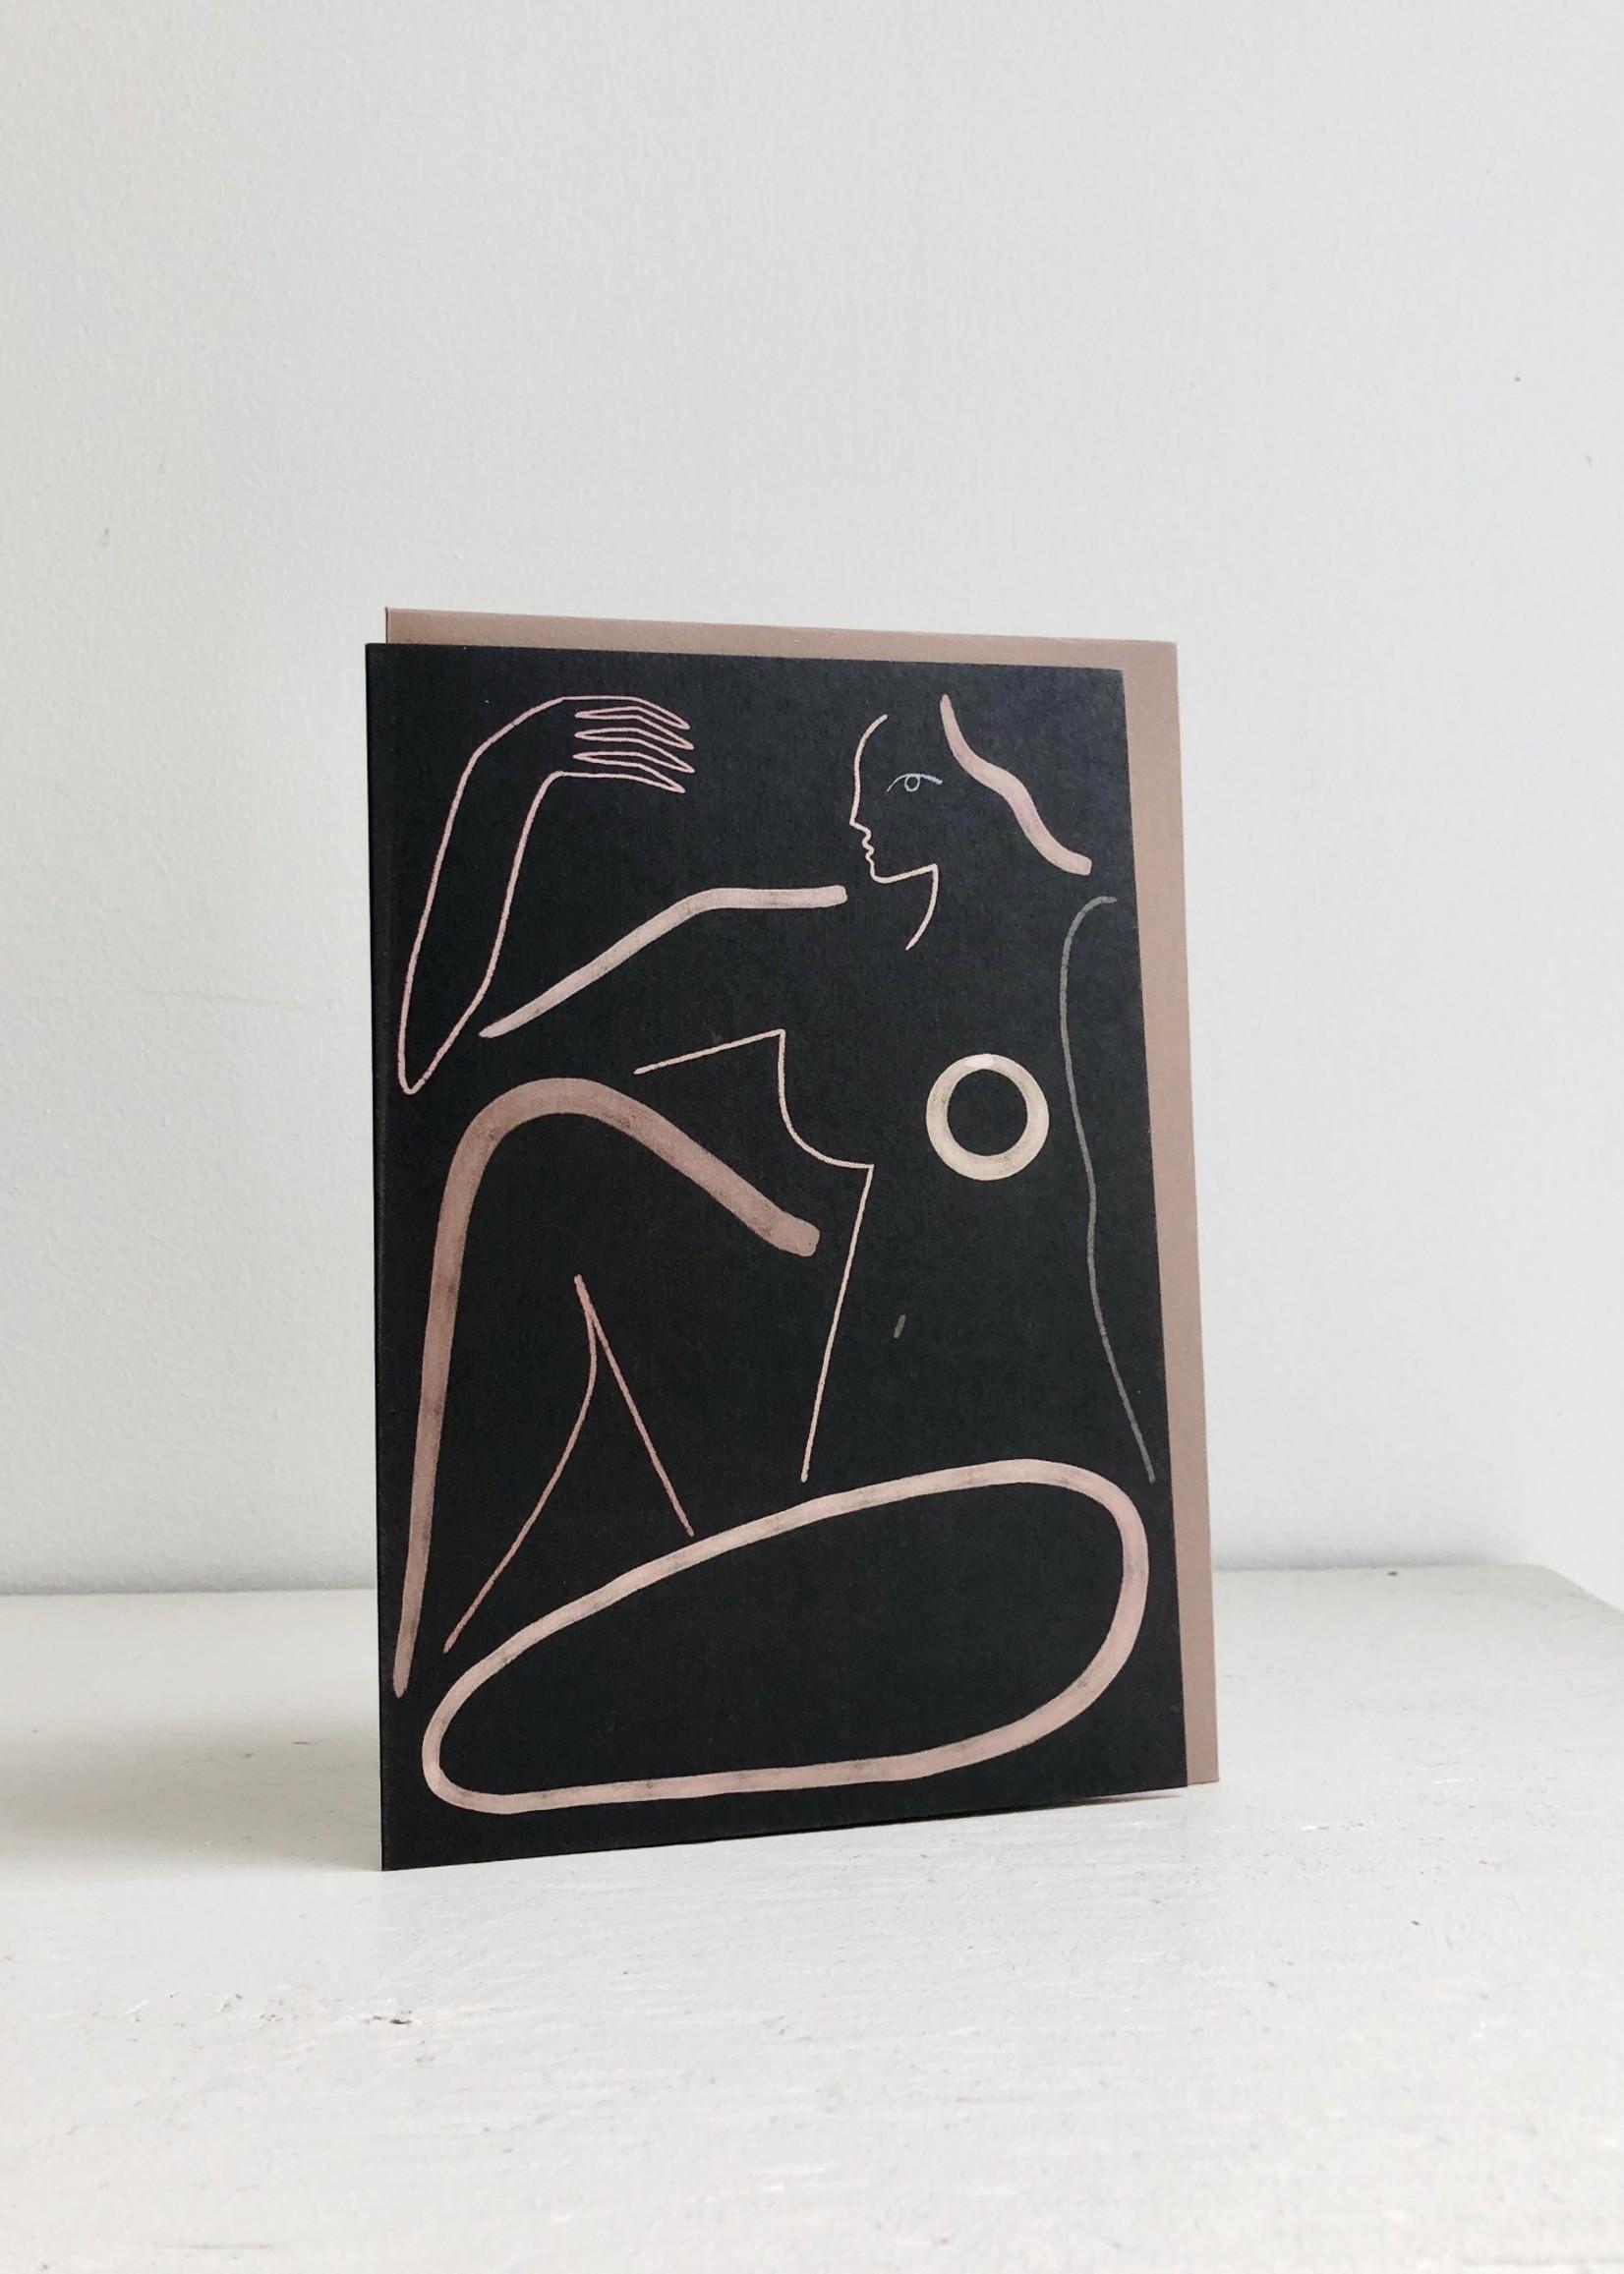 Wrap Stationery Kit Agar Greeting Cards by Wrap Stationery